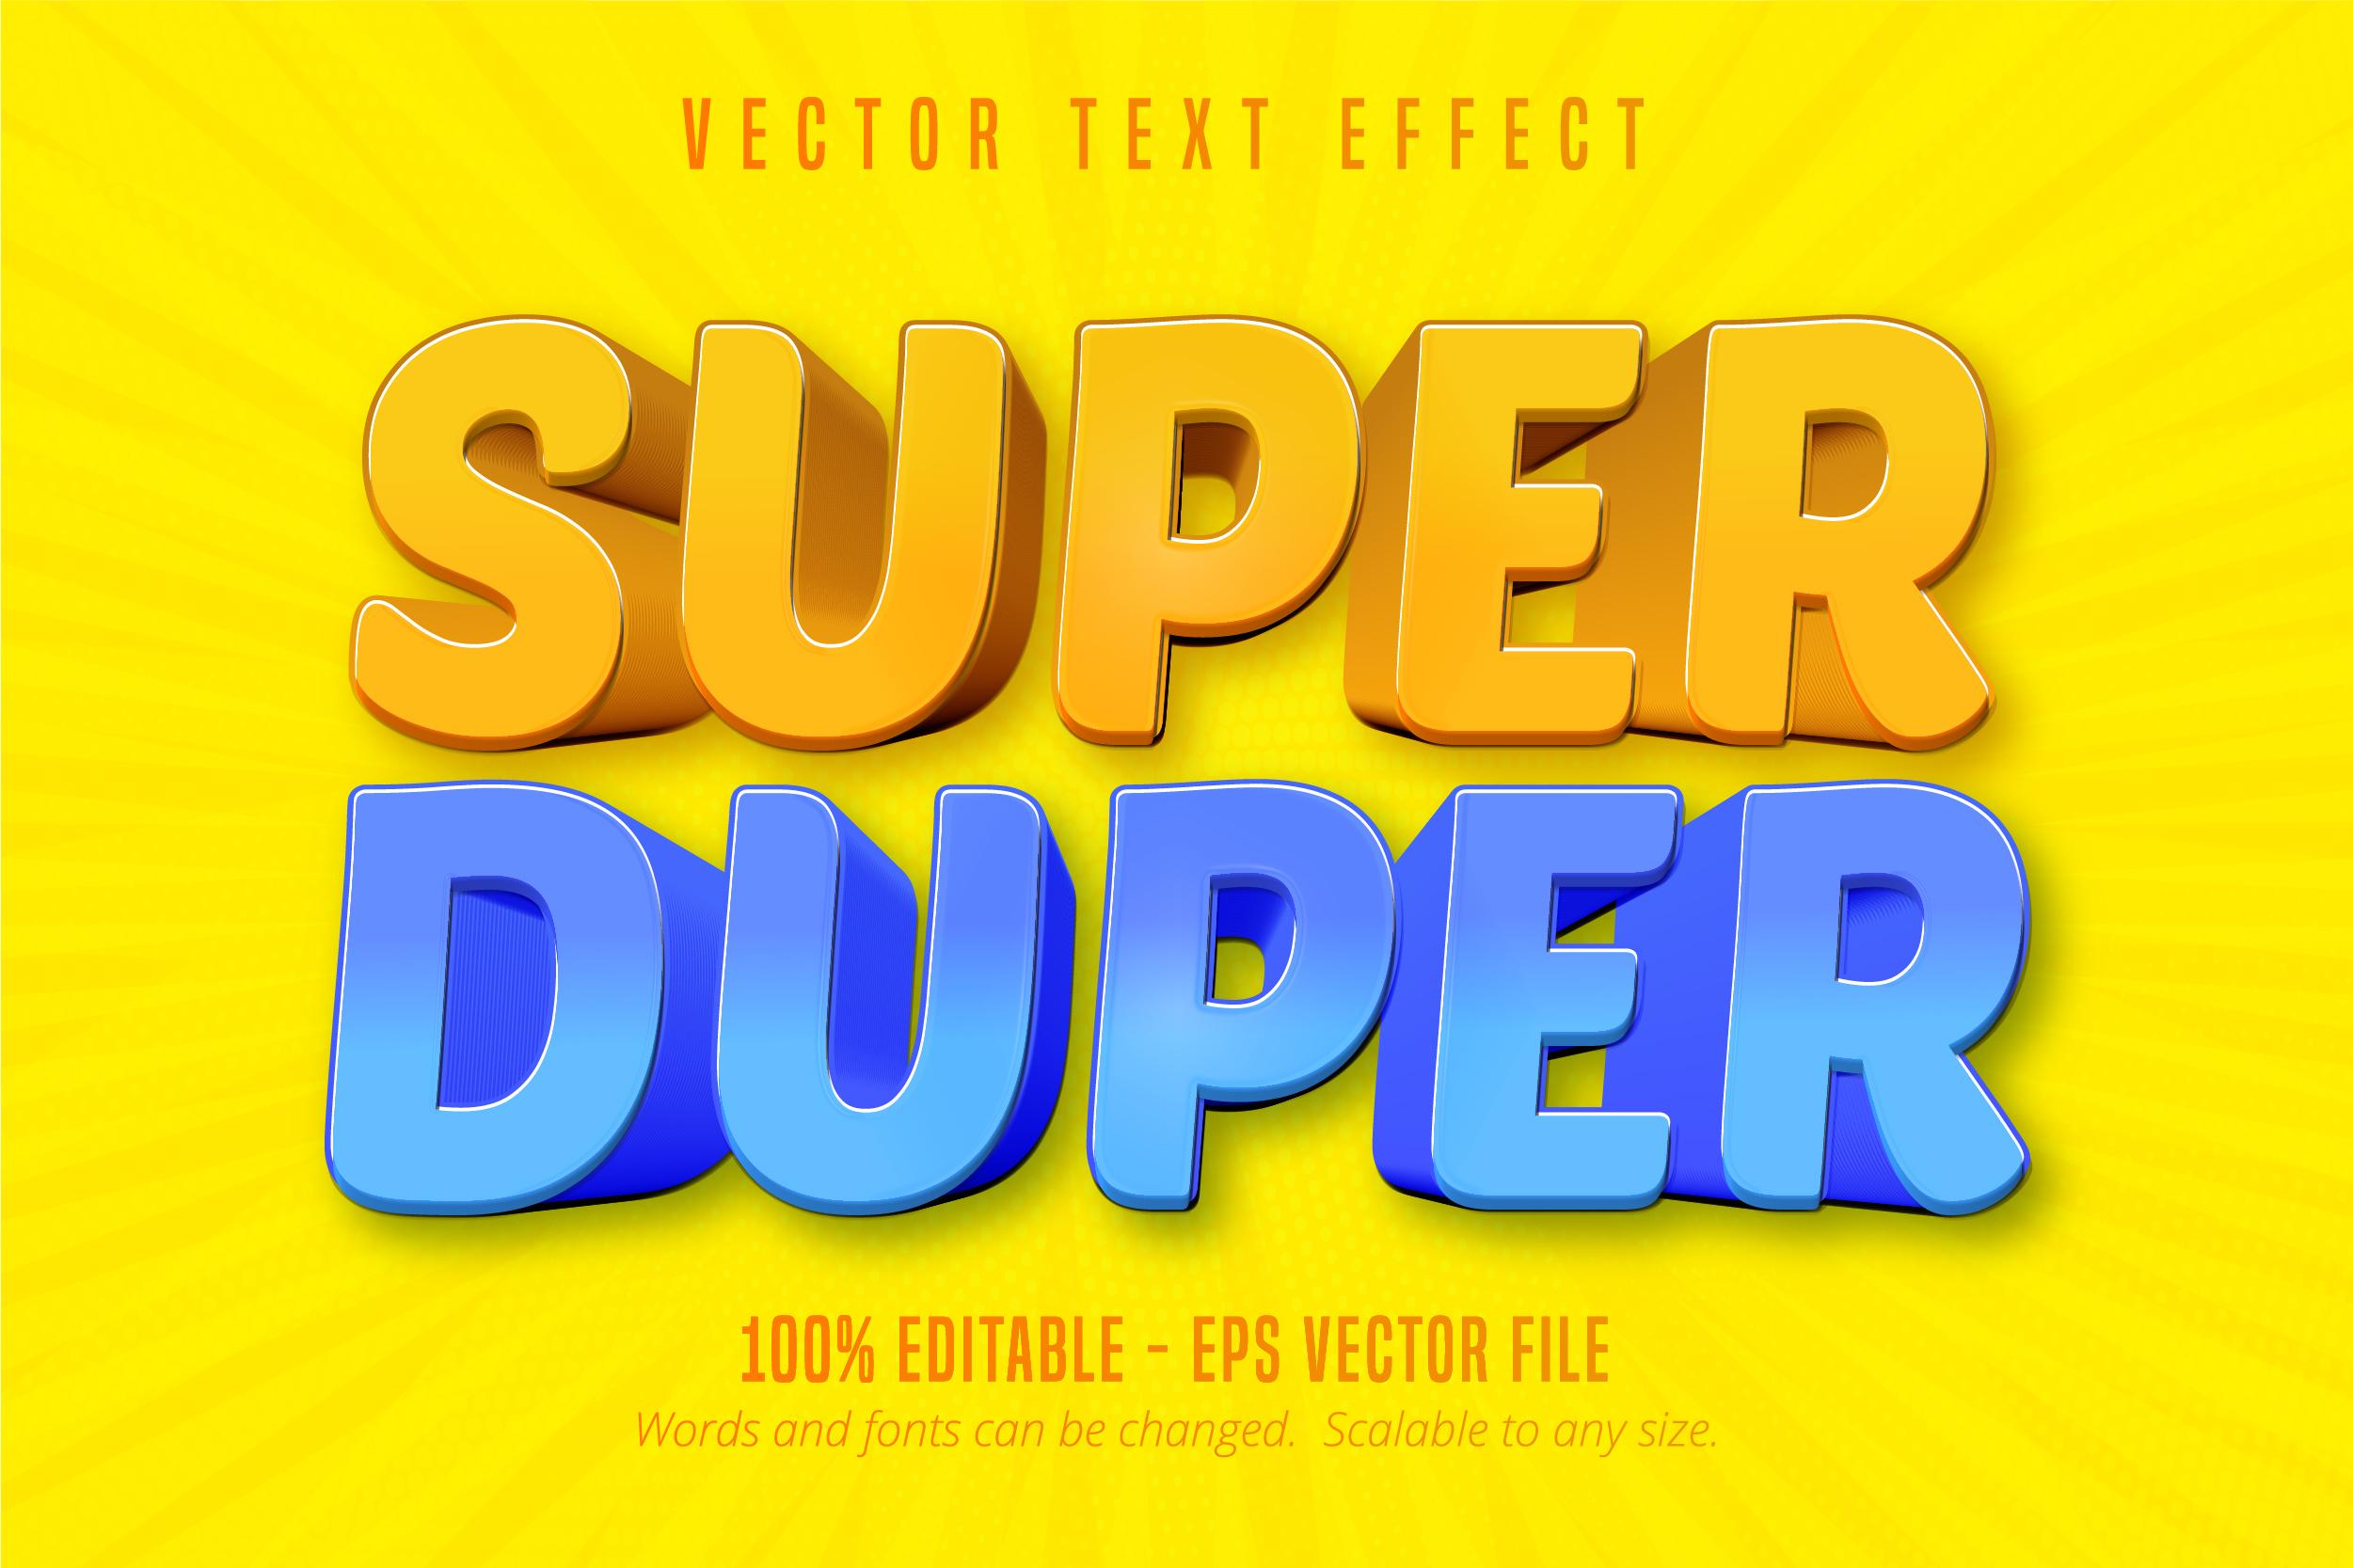 texto super duper, efeito de texto editável estilo cartoon